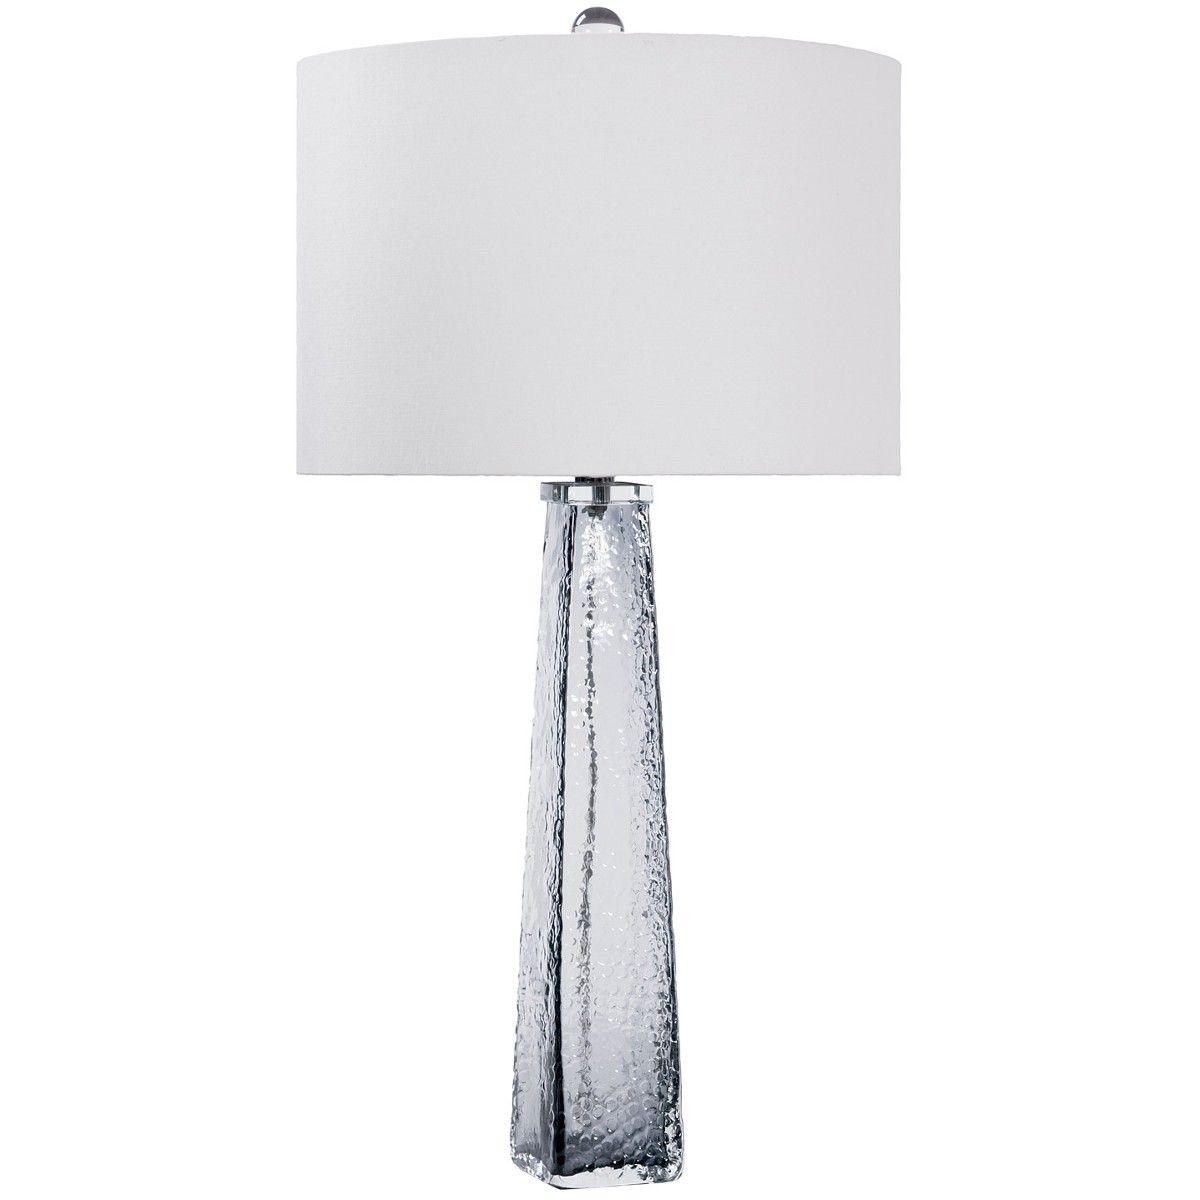 sk blu lgstlt grey modern stilt floor lamps dot smoke tripod lamp